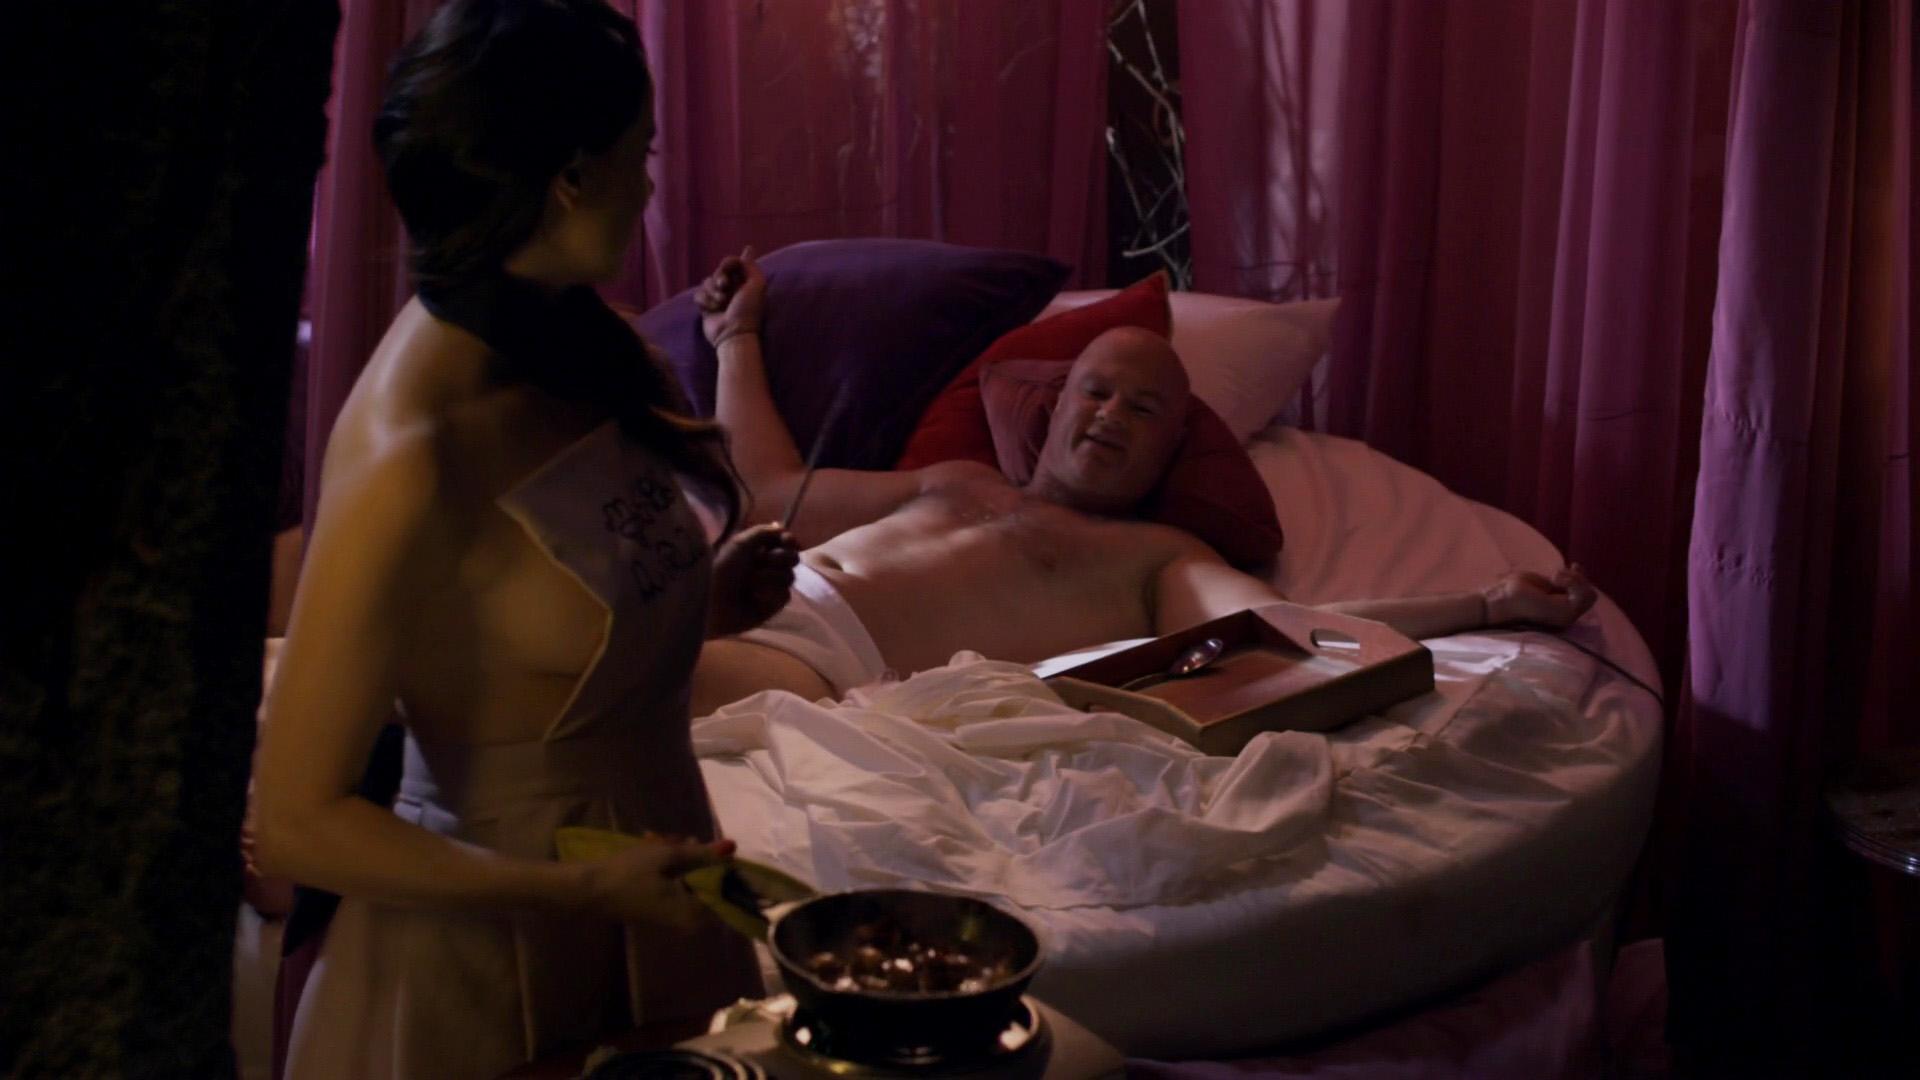 Anna nicole smith naked having sex